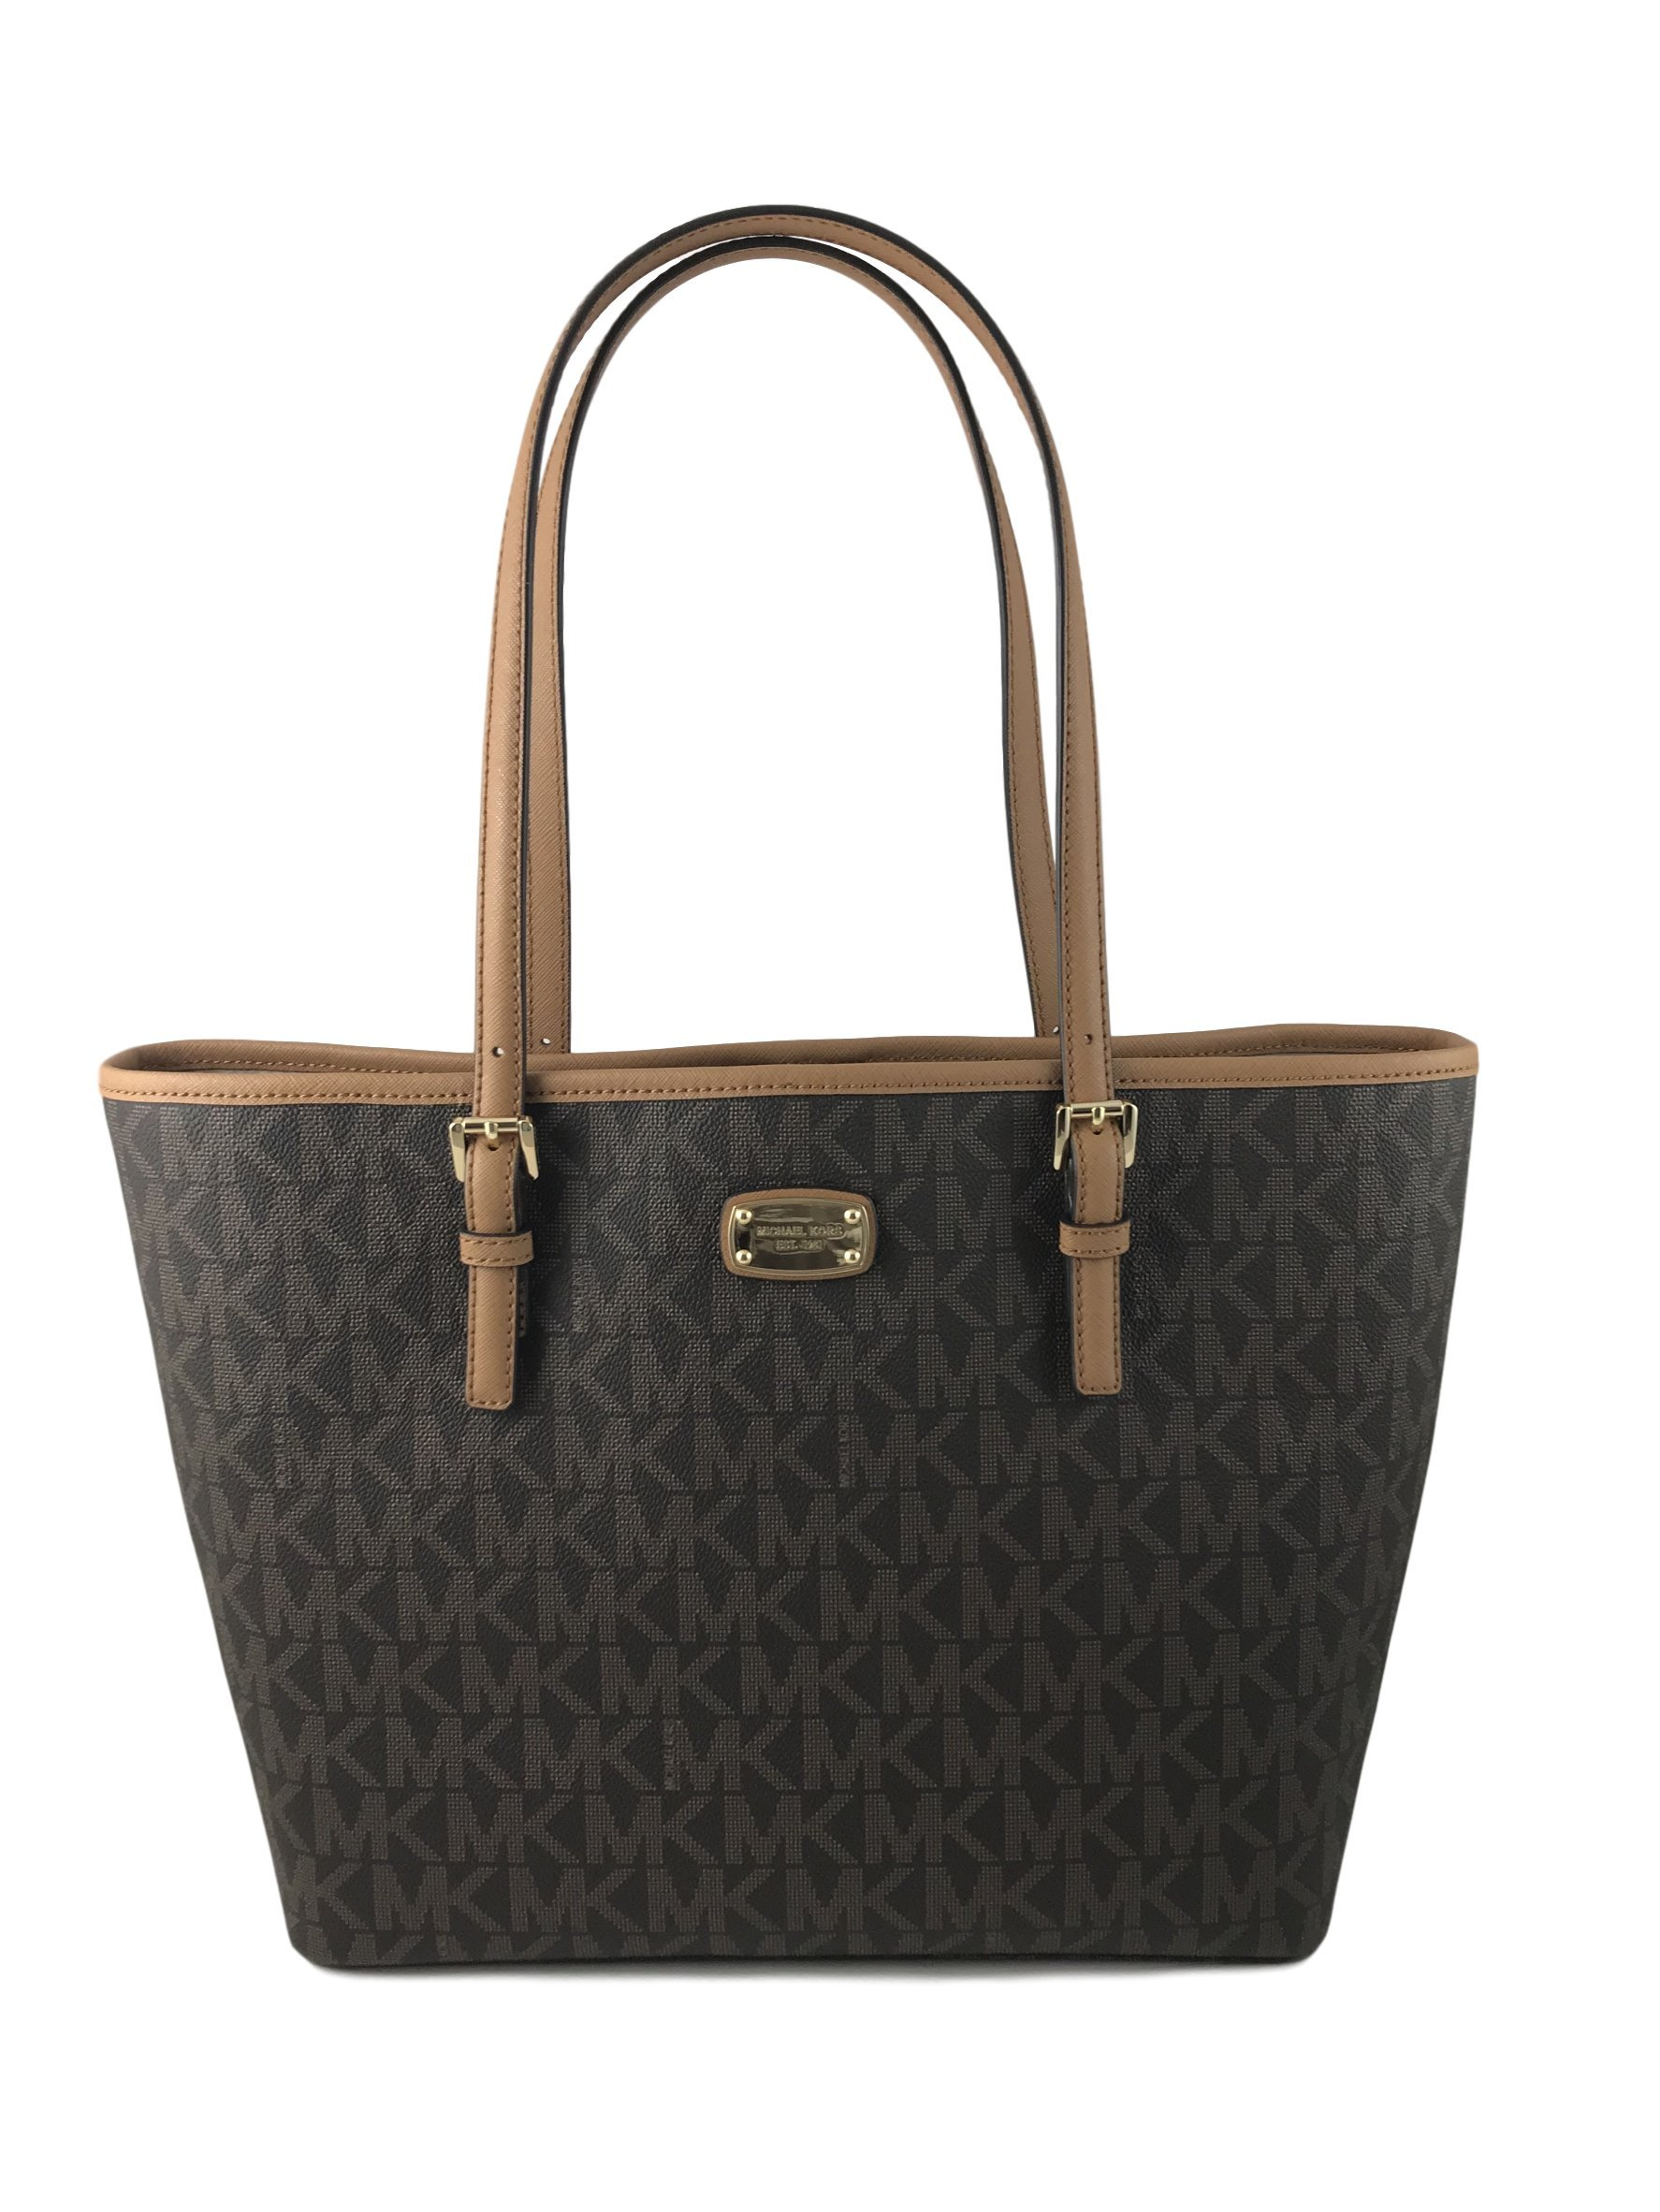 MICHAEL KORS Jet Set Travel Signature Carryall PVC SM Tote Shopper Bag in Brown